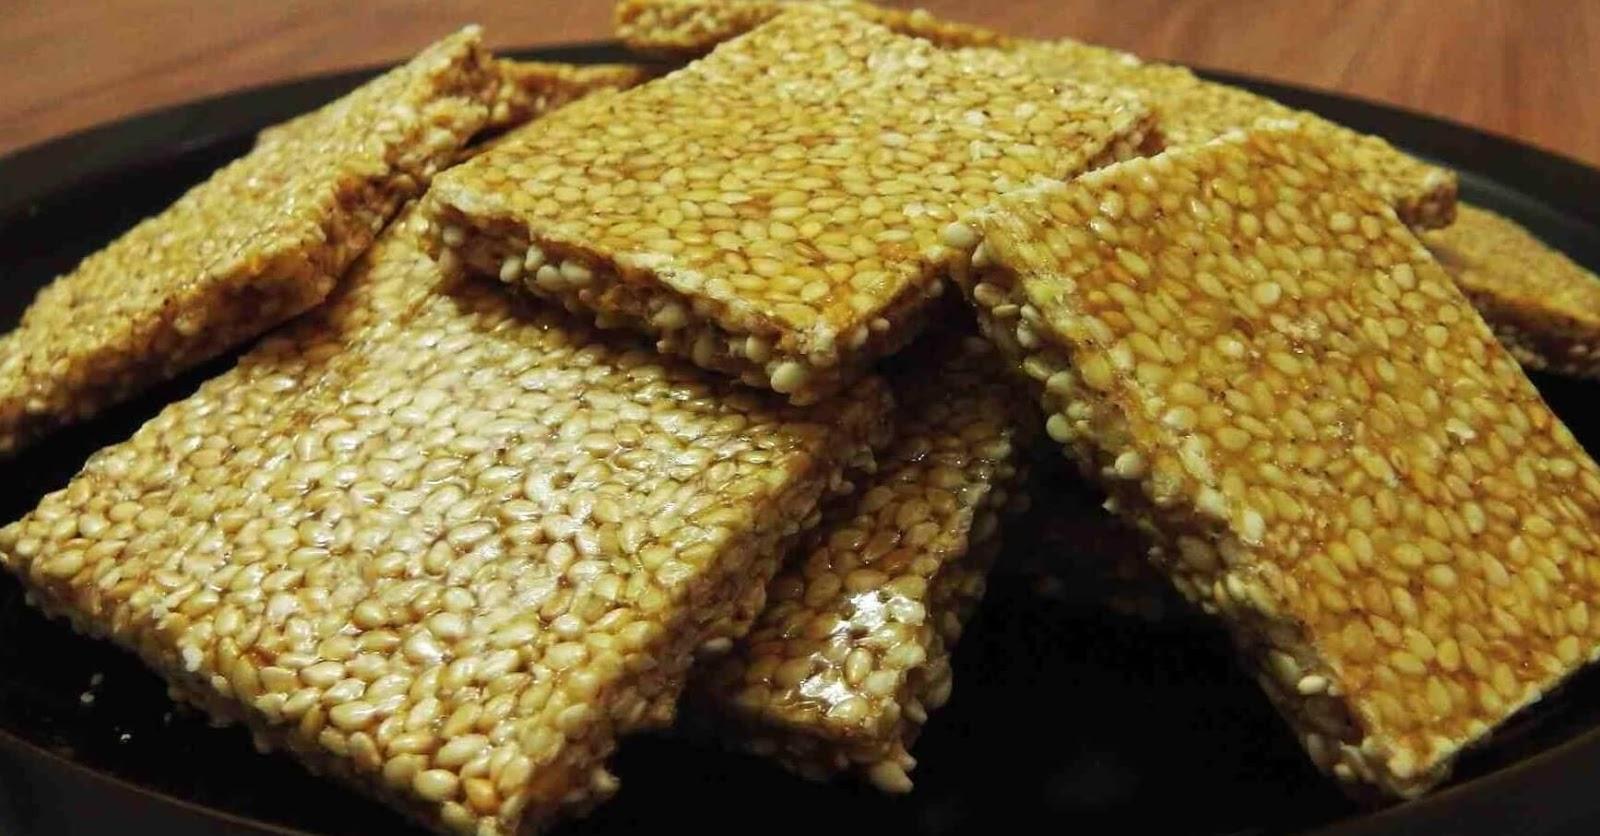 chikki-tradicionalni-indijski-sladkor-secret-world